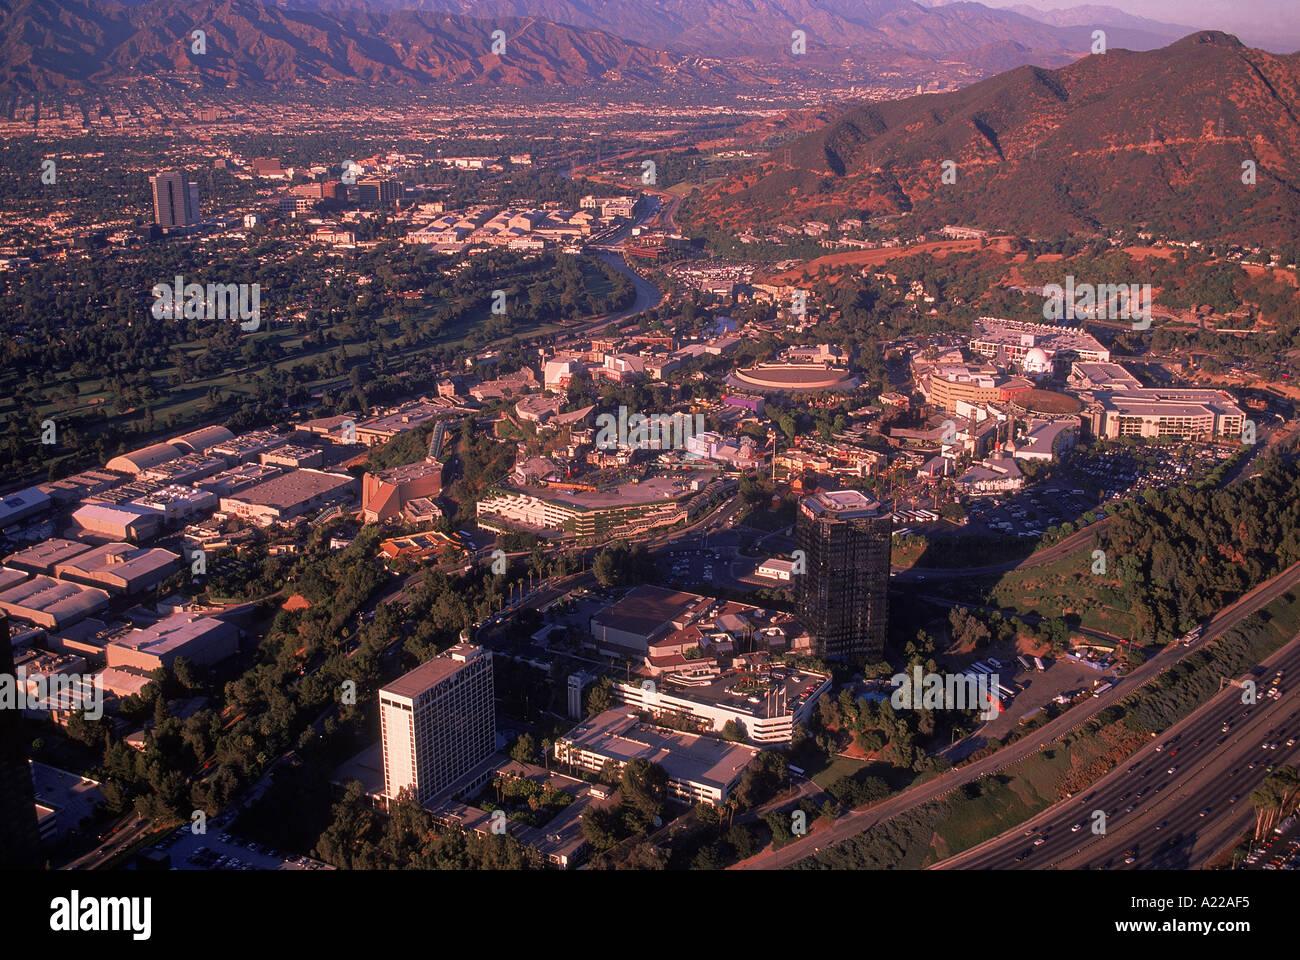 Studios Map Universal Studios Studios Hollywood SouthTracks The - City of los angeles jurisdiction map